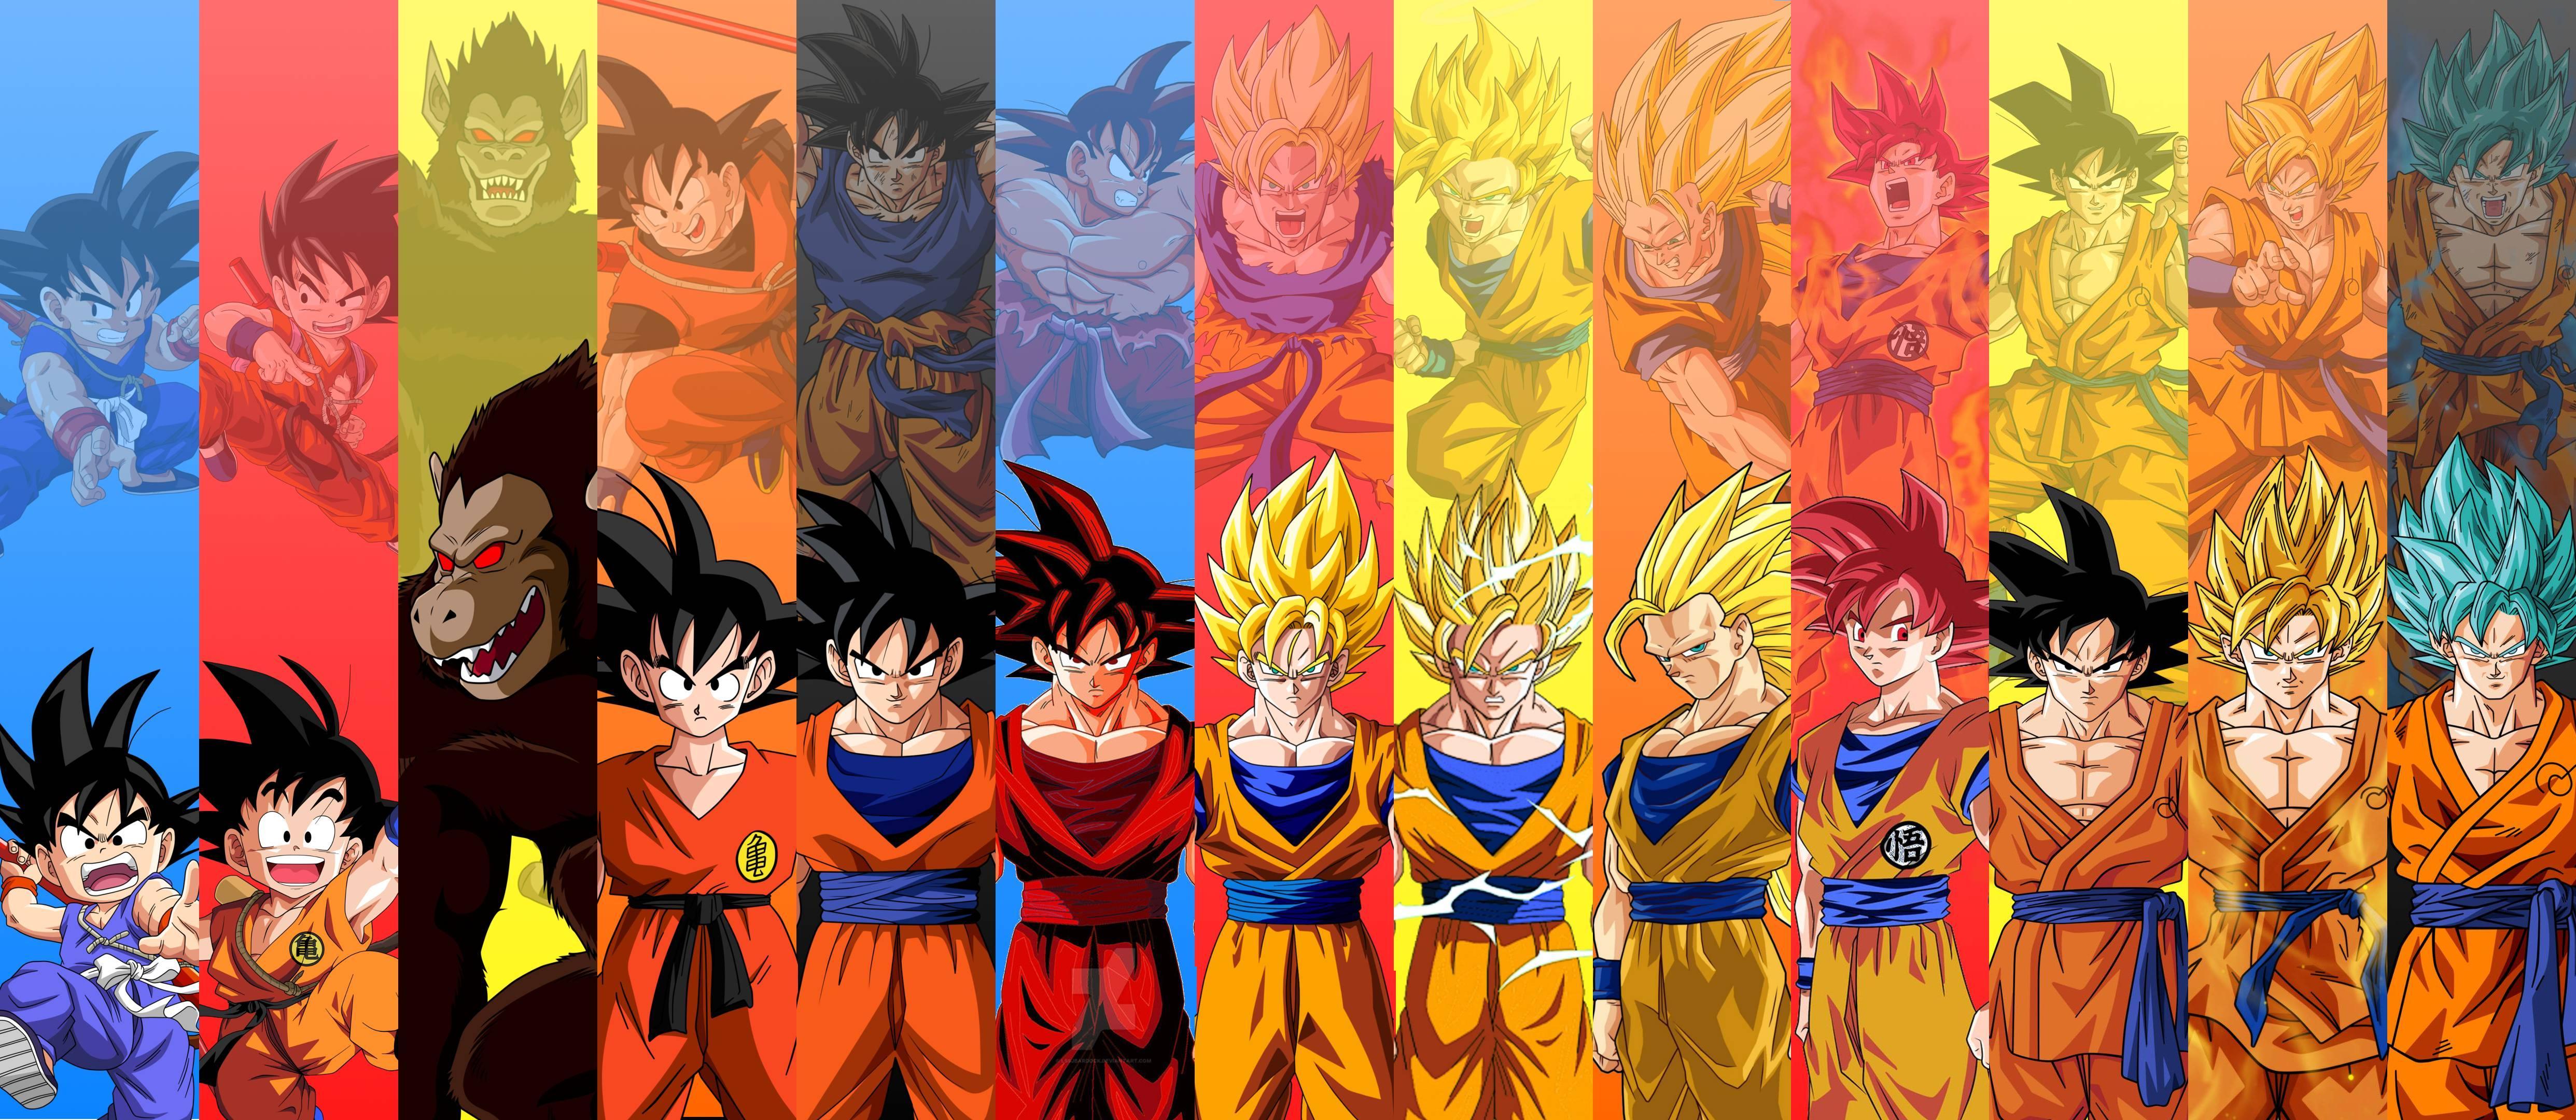 Goku Super Saiyan 4 Wallpapers